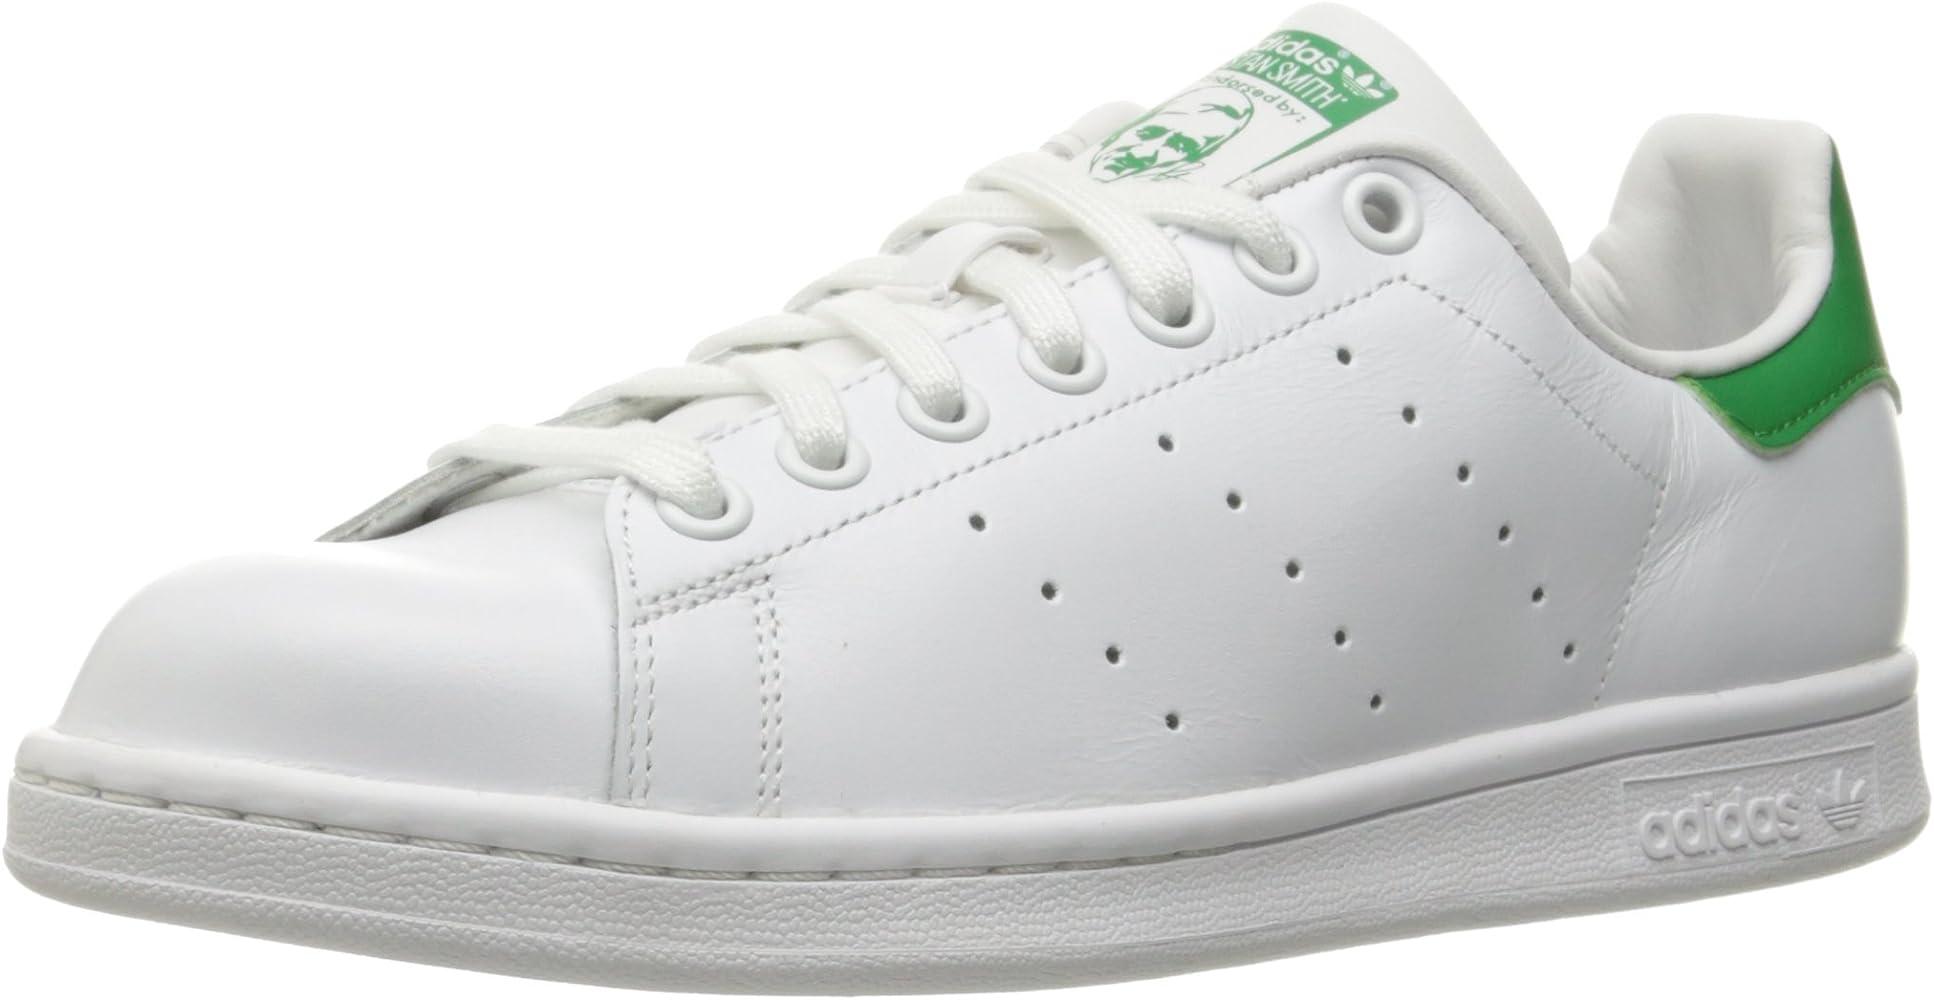 5b94bf3b7d adidas Originals Women's Stan Smith Shoe, Footwear White/Footwear ...